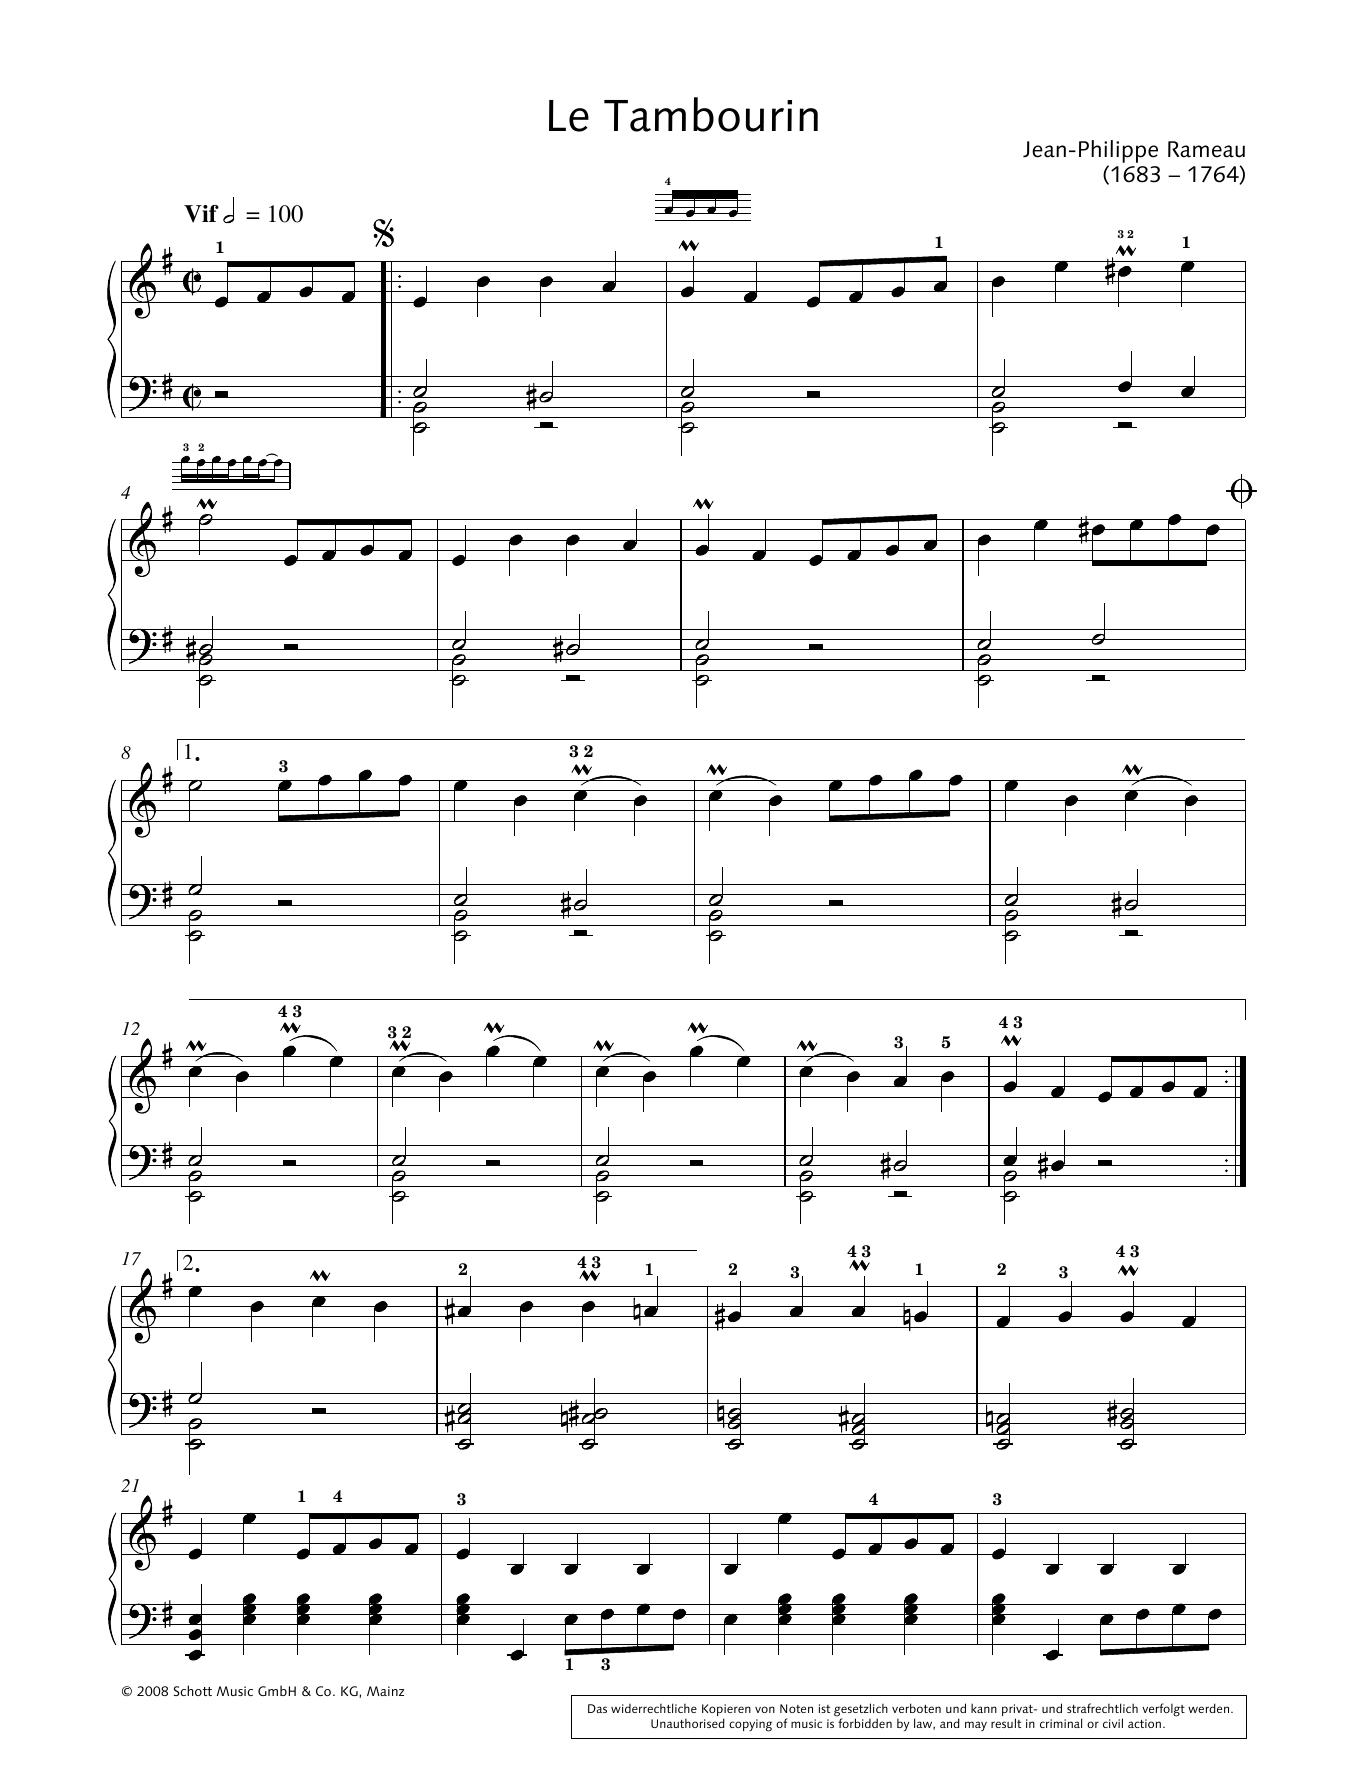 Le Tambourin Sheet Music